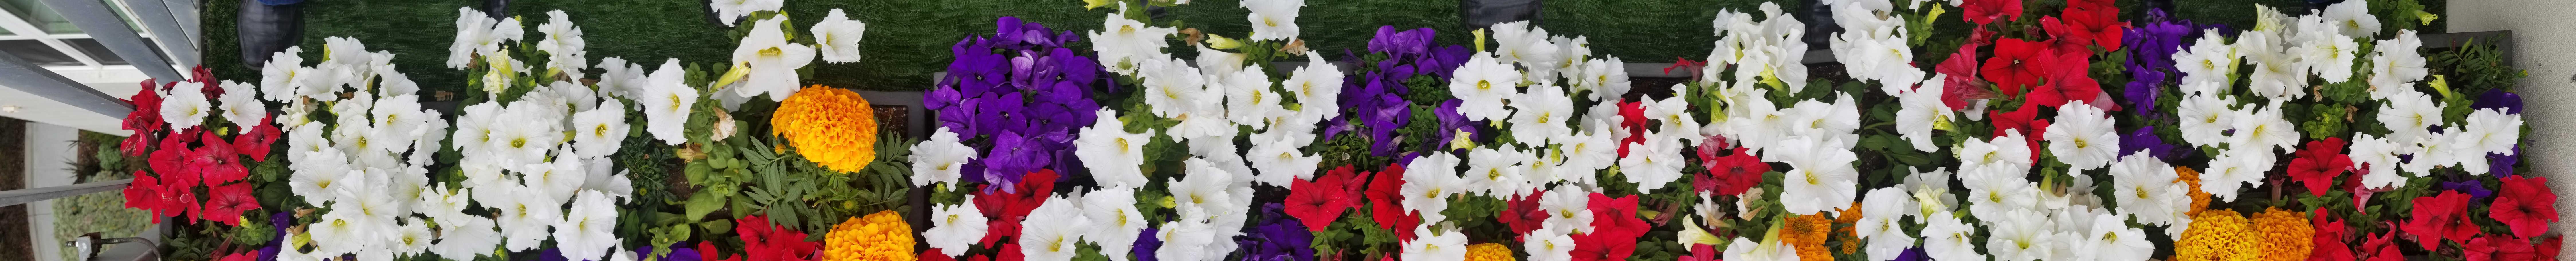 Petunias and Marigolds resized